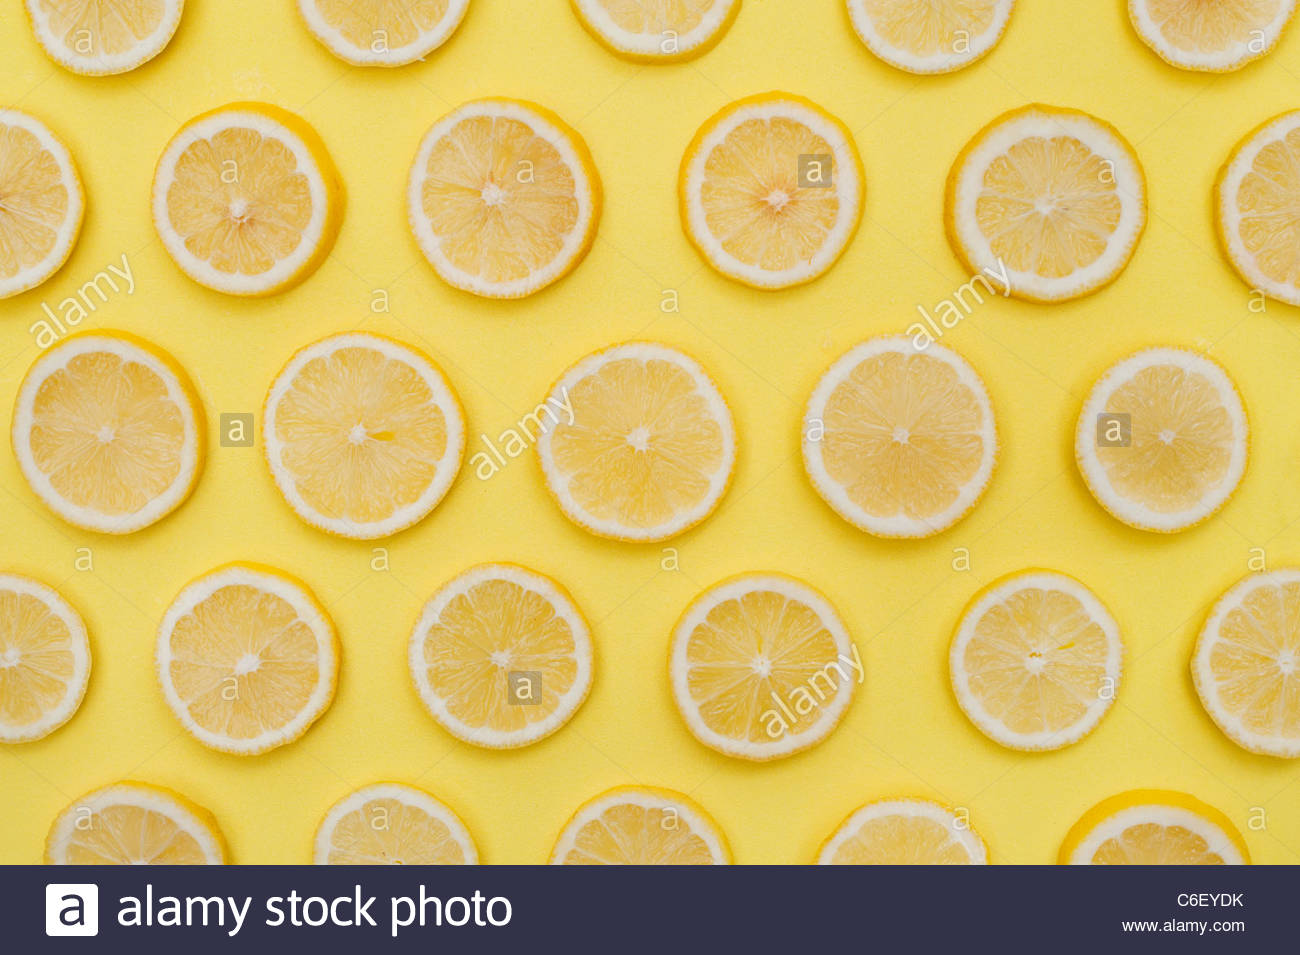 Citrus x Limon . Lemon fruit slices on yellow background . Food pattern - Stock Image